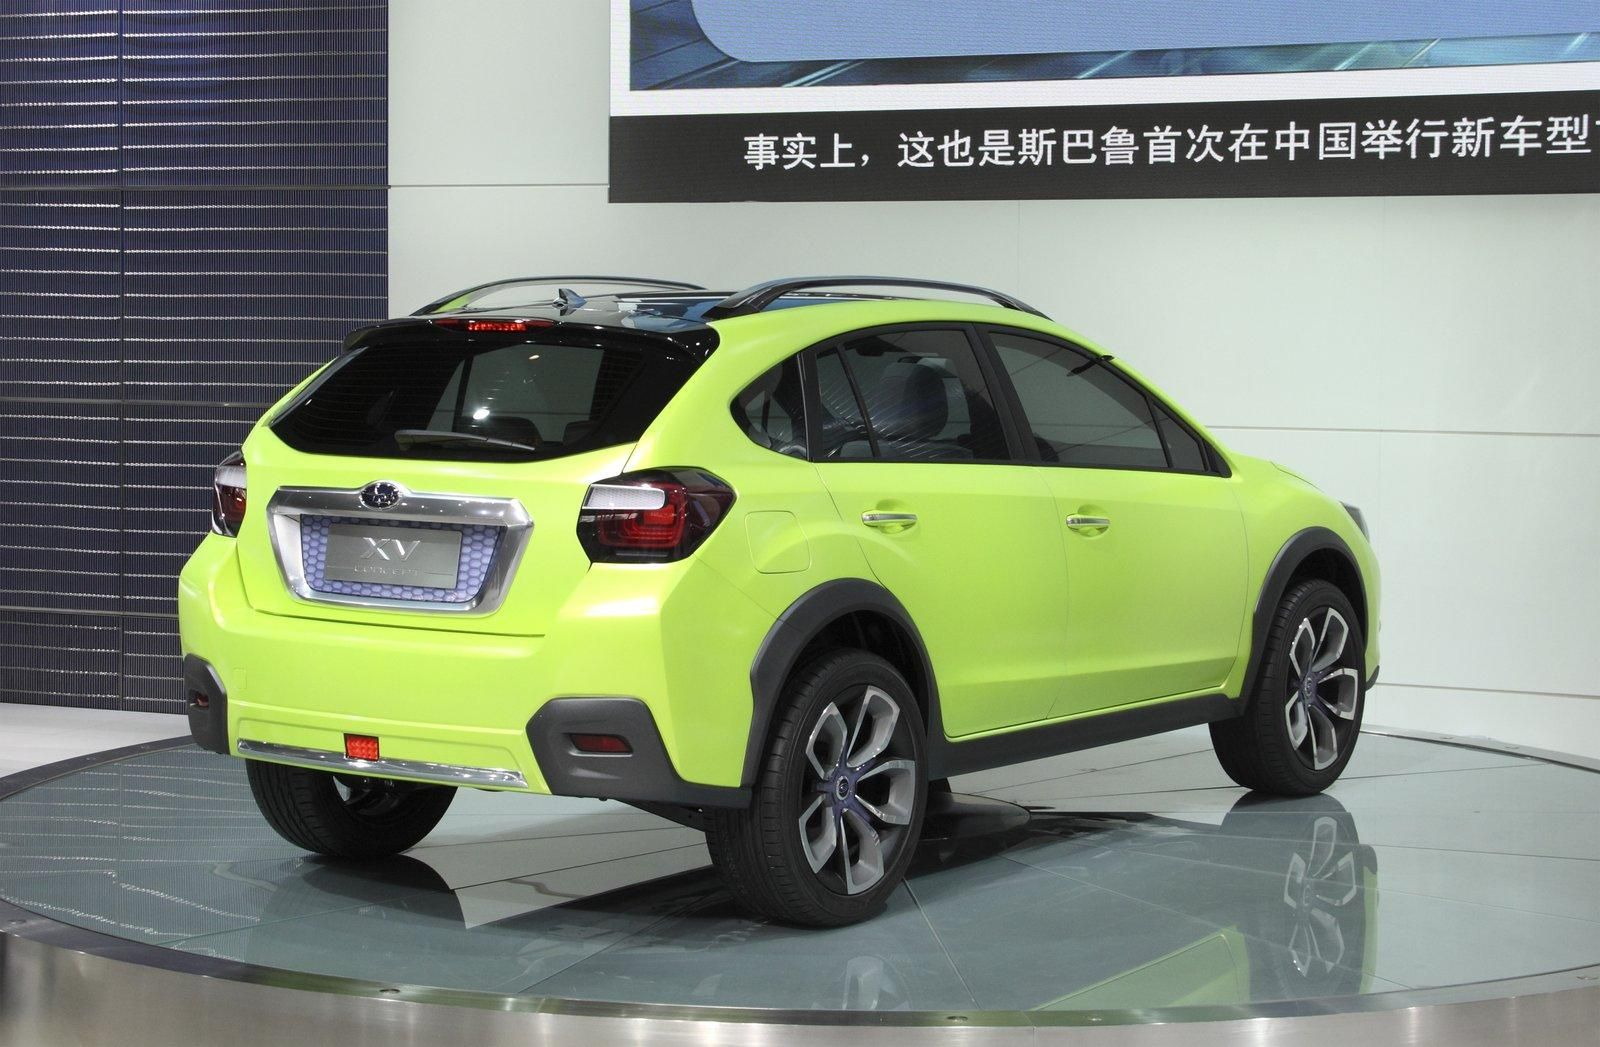 Automotive Group Best Small Suv Cars Digital Vehicles Check Blog Subaru Offroad